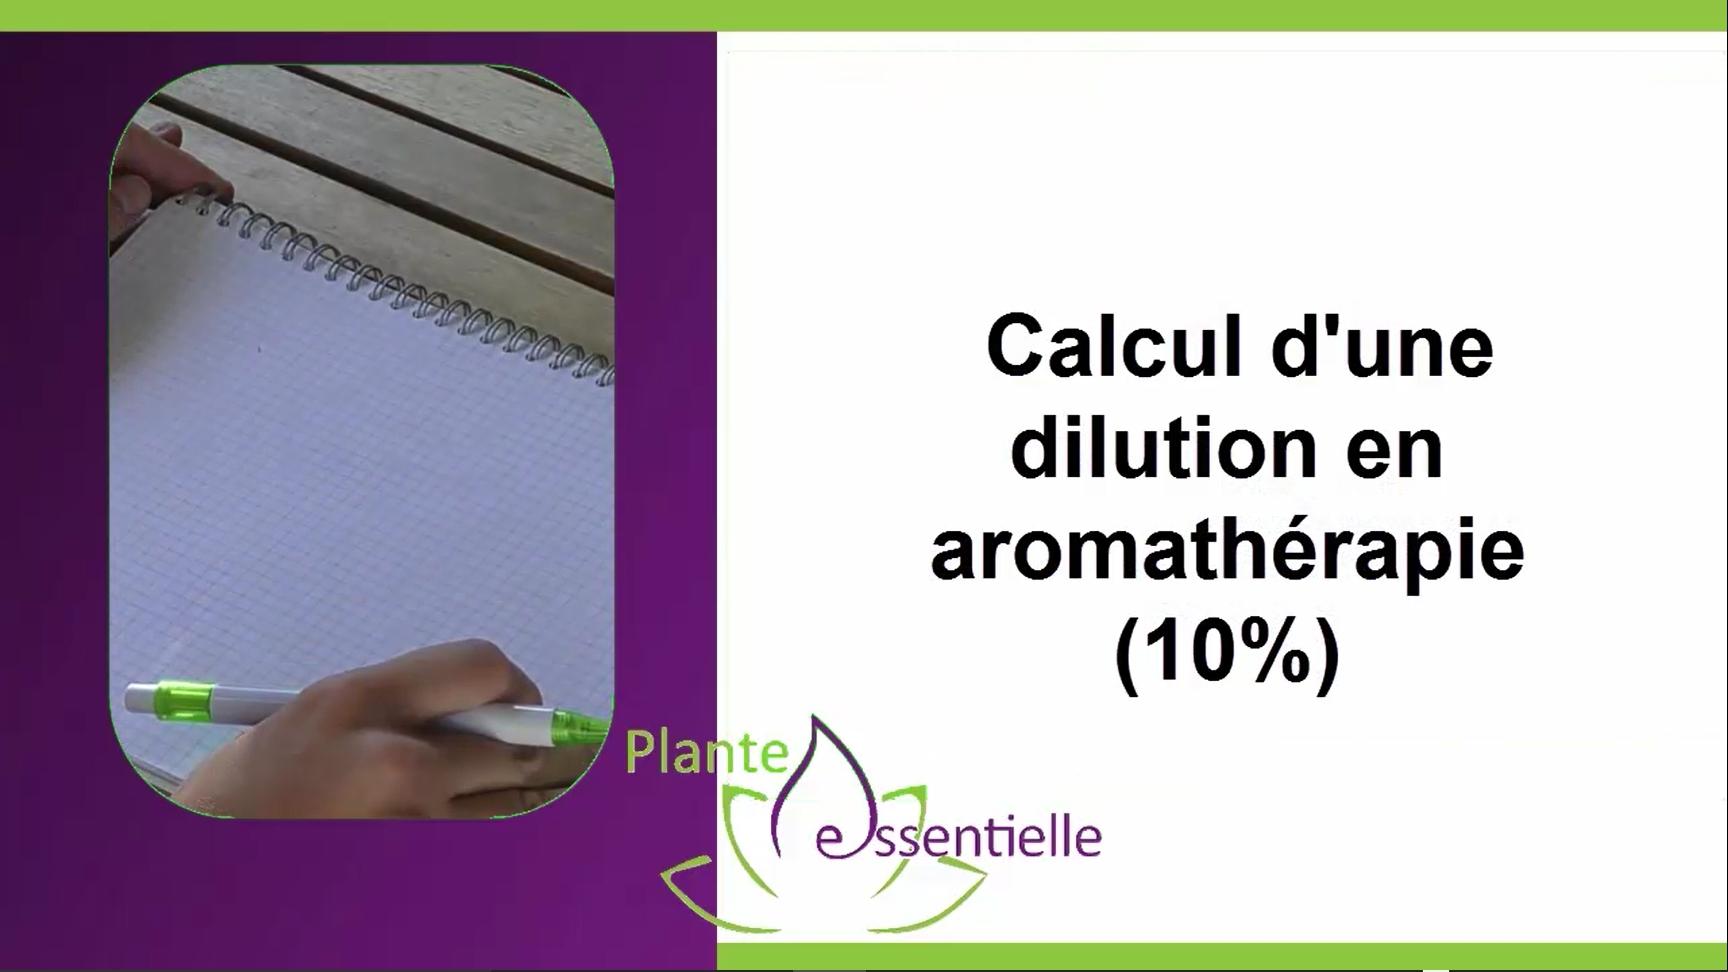 Calcul de dilution en aromathérapie